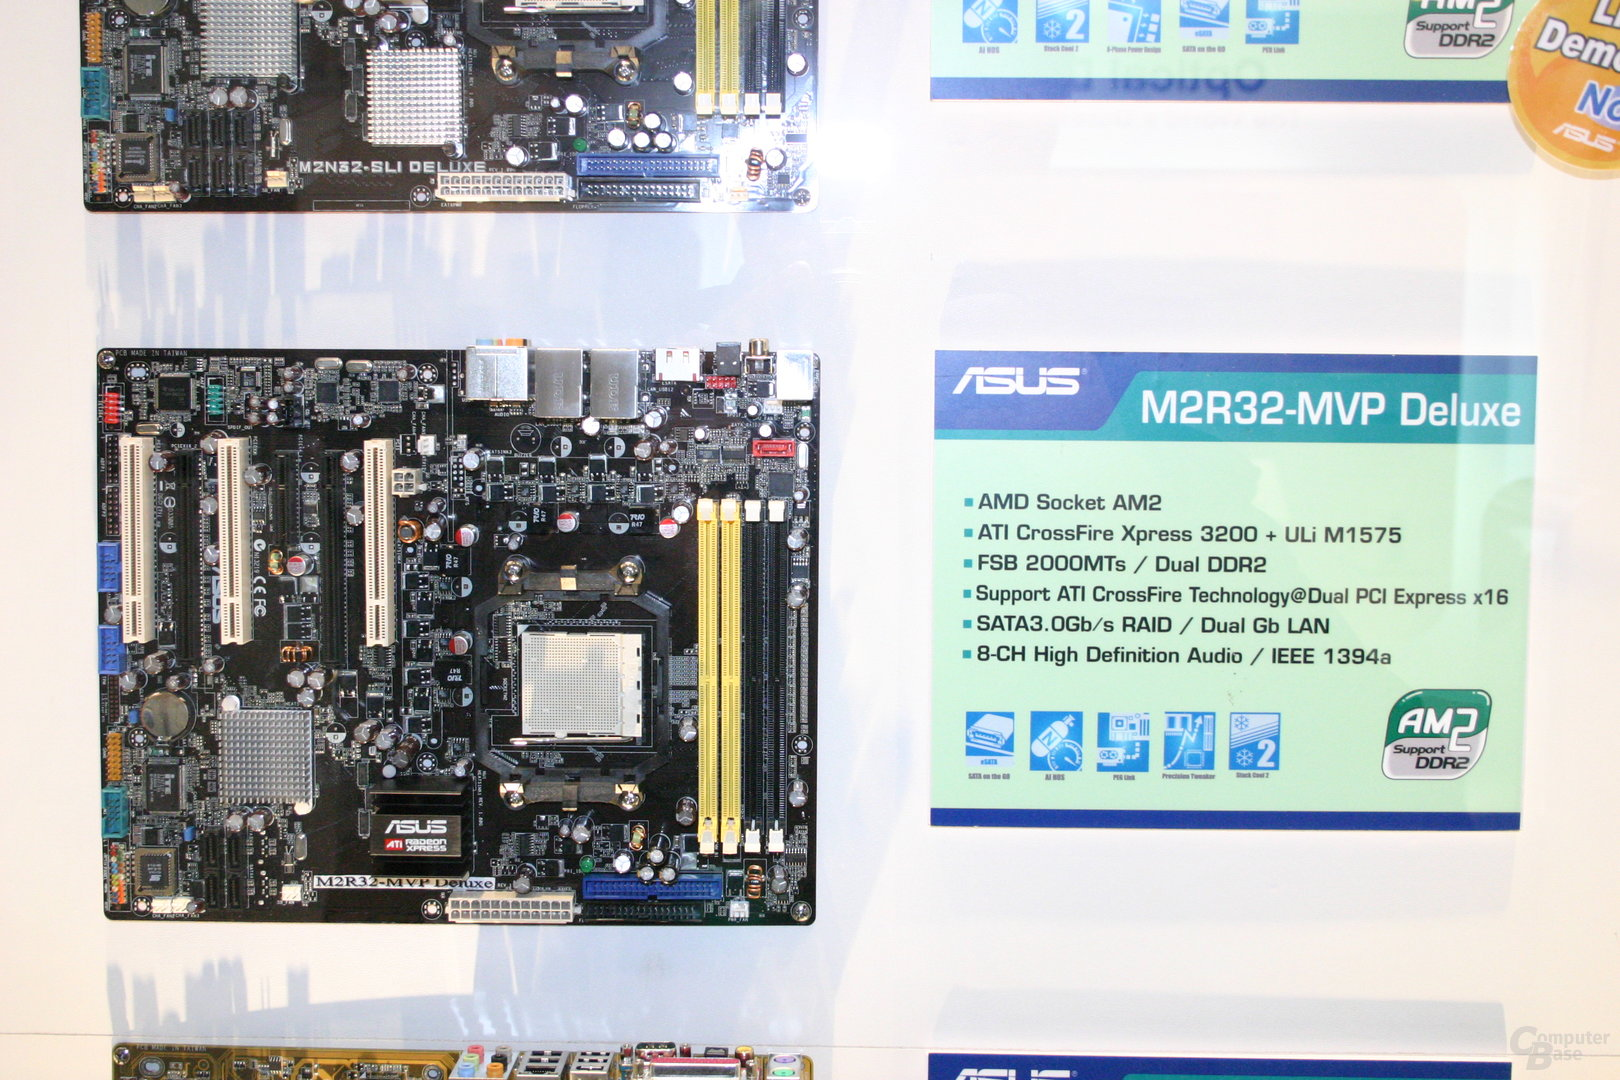 Asus M2R32-MVP Deluxe